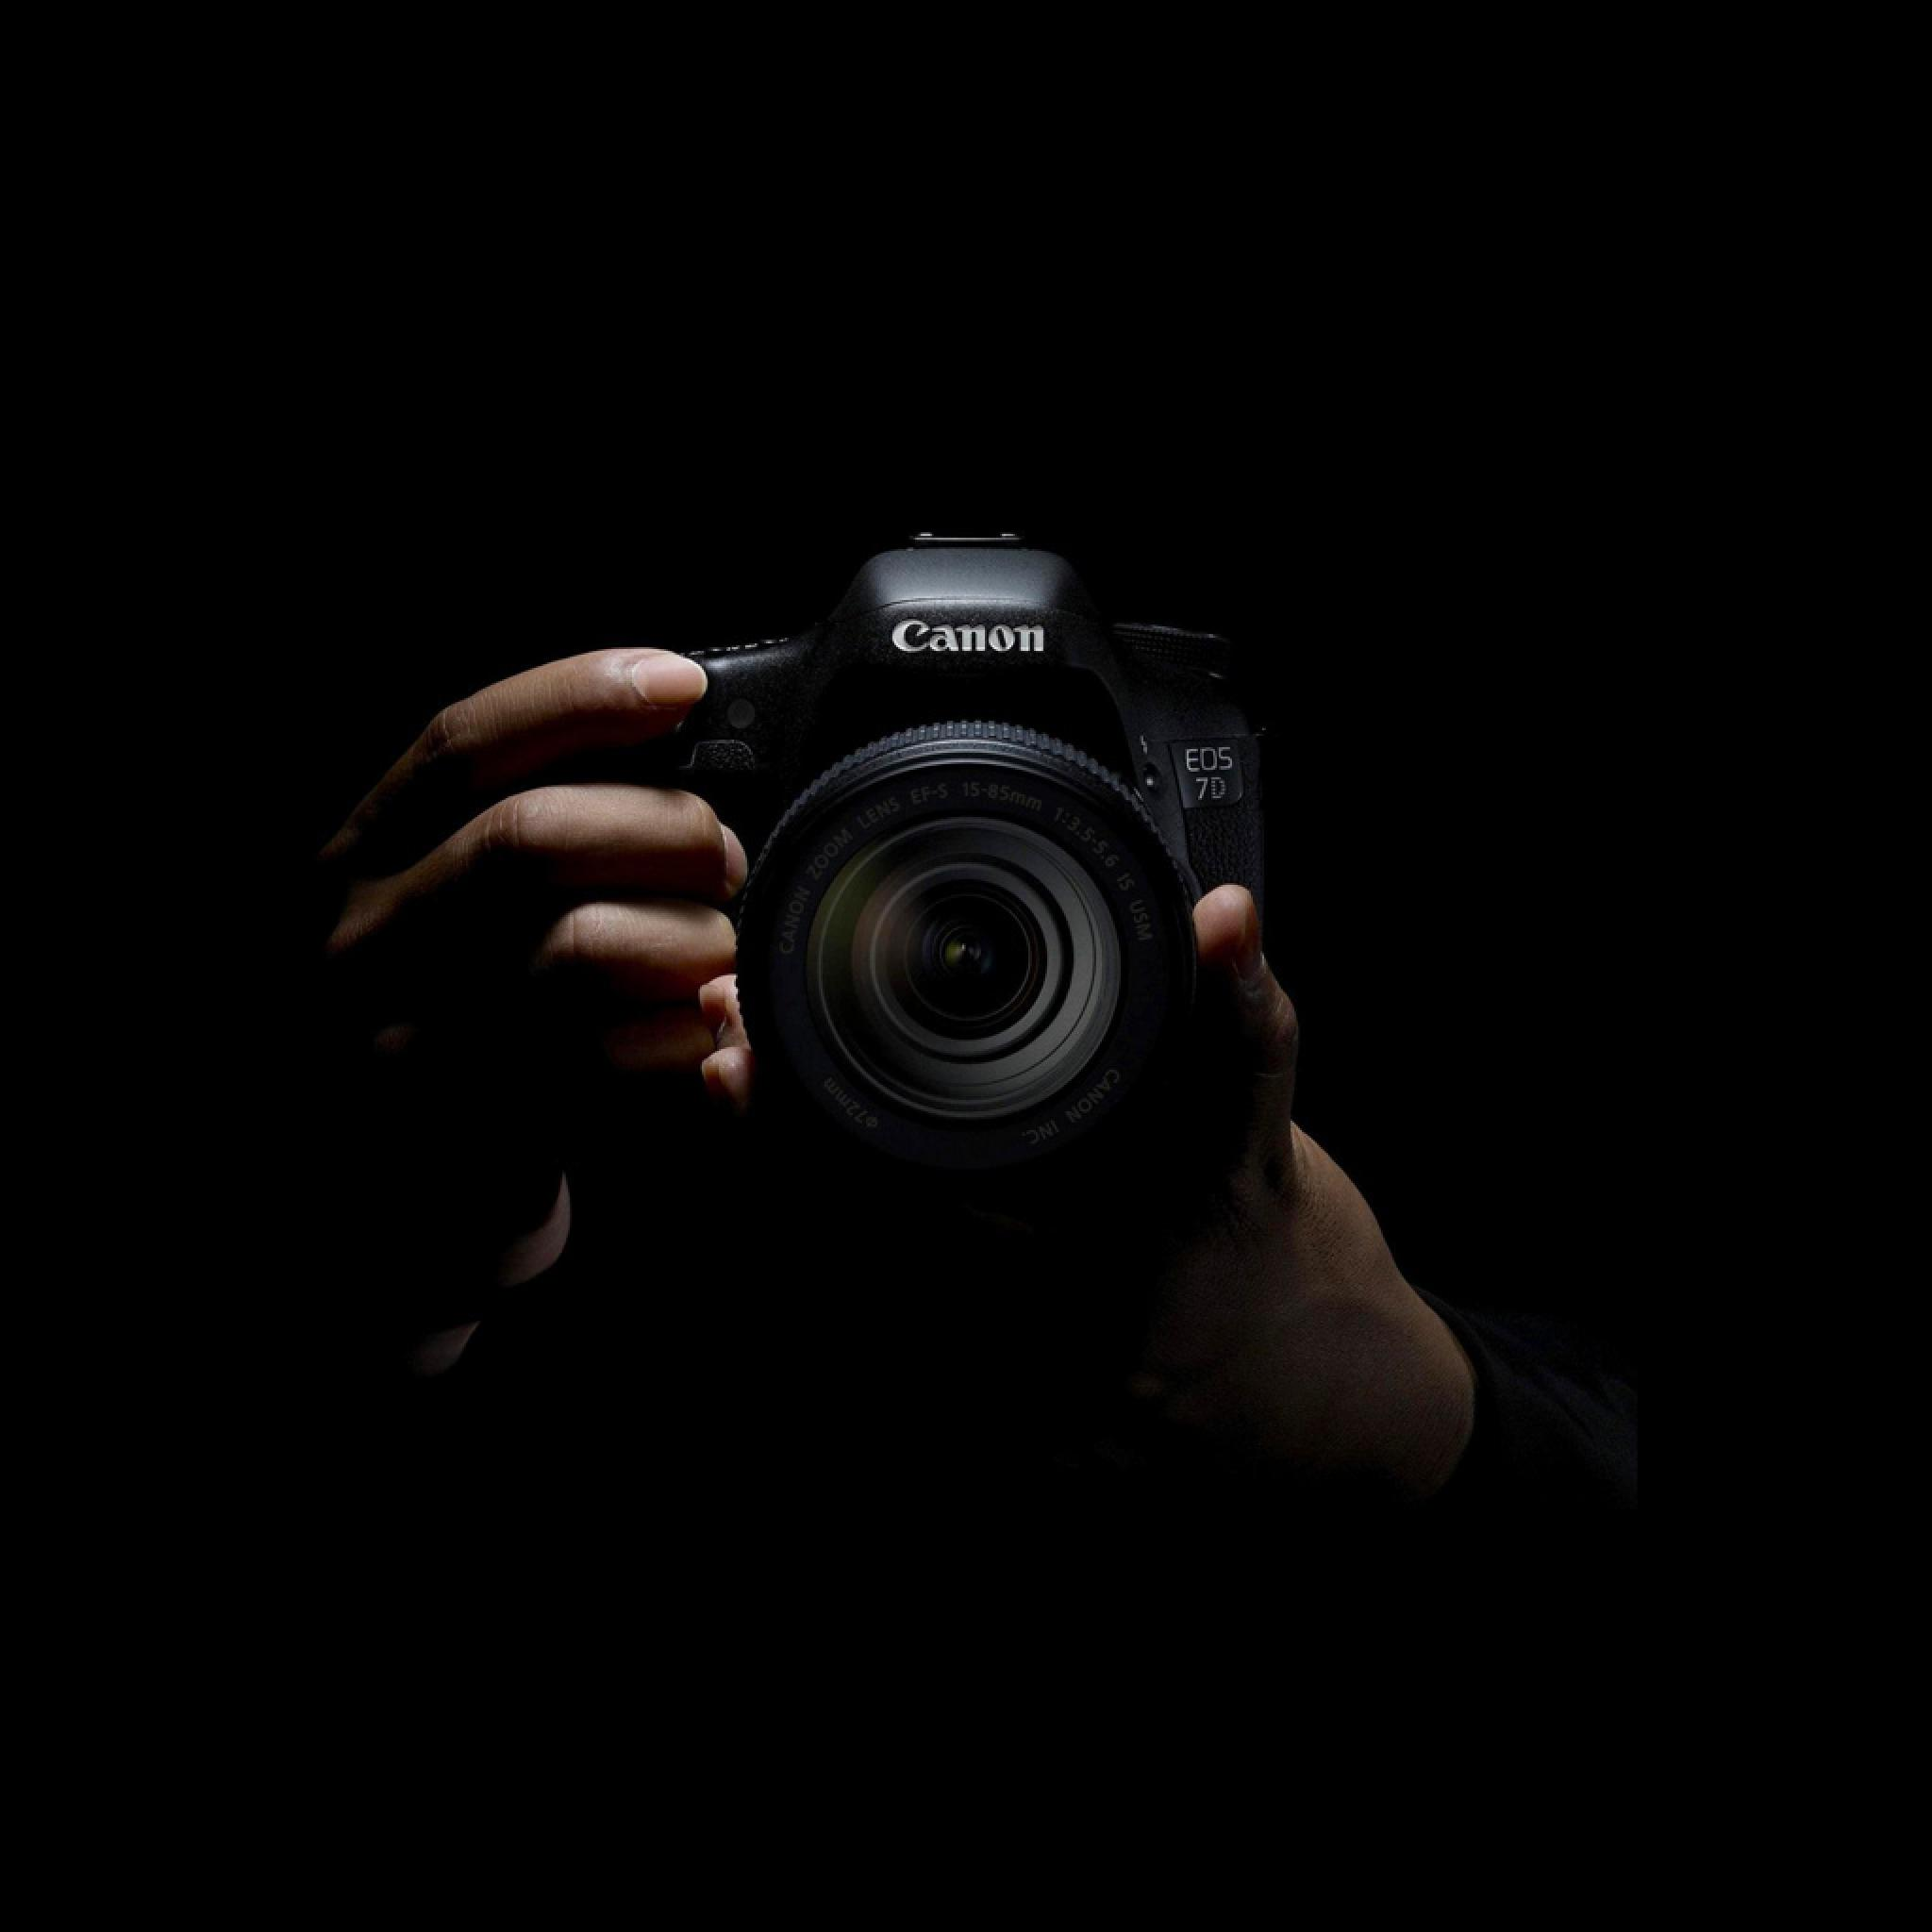 X Ray Wallpaper Iphone 7 Miscellaneous Canon Eos 7d Camera Black Ipad Iphone Hd